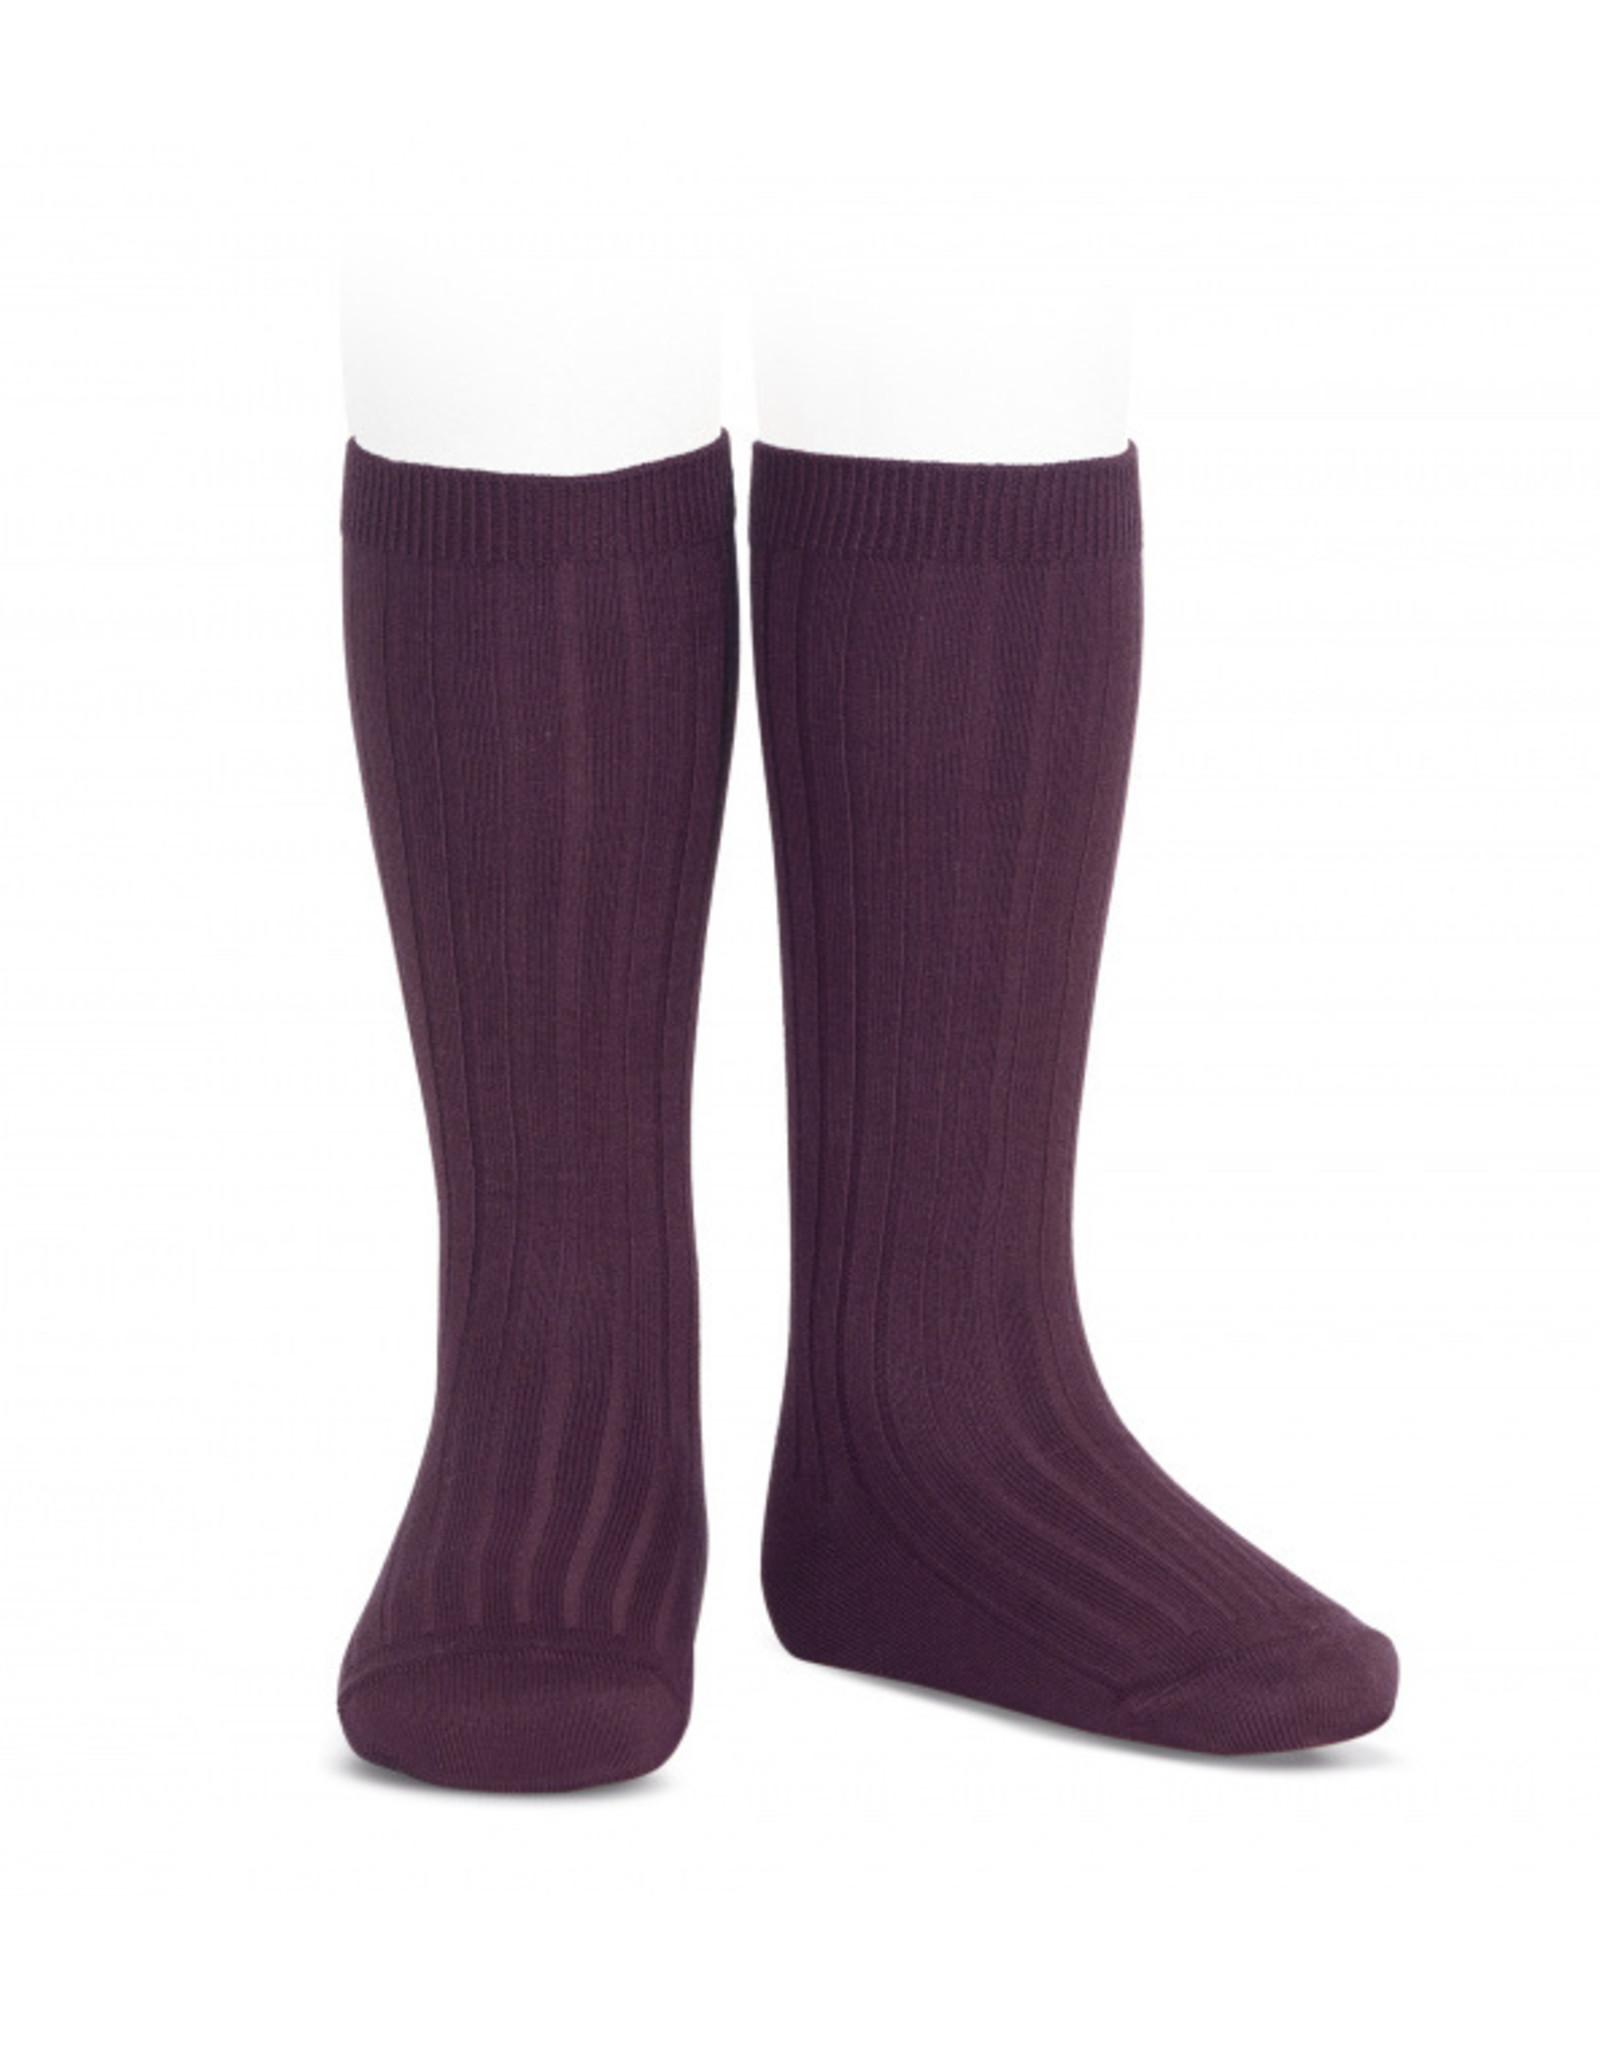 CONDOR Bordeaux Ribbed Knee Socks